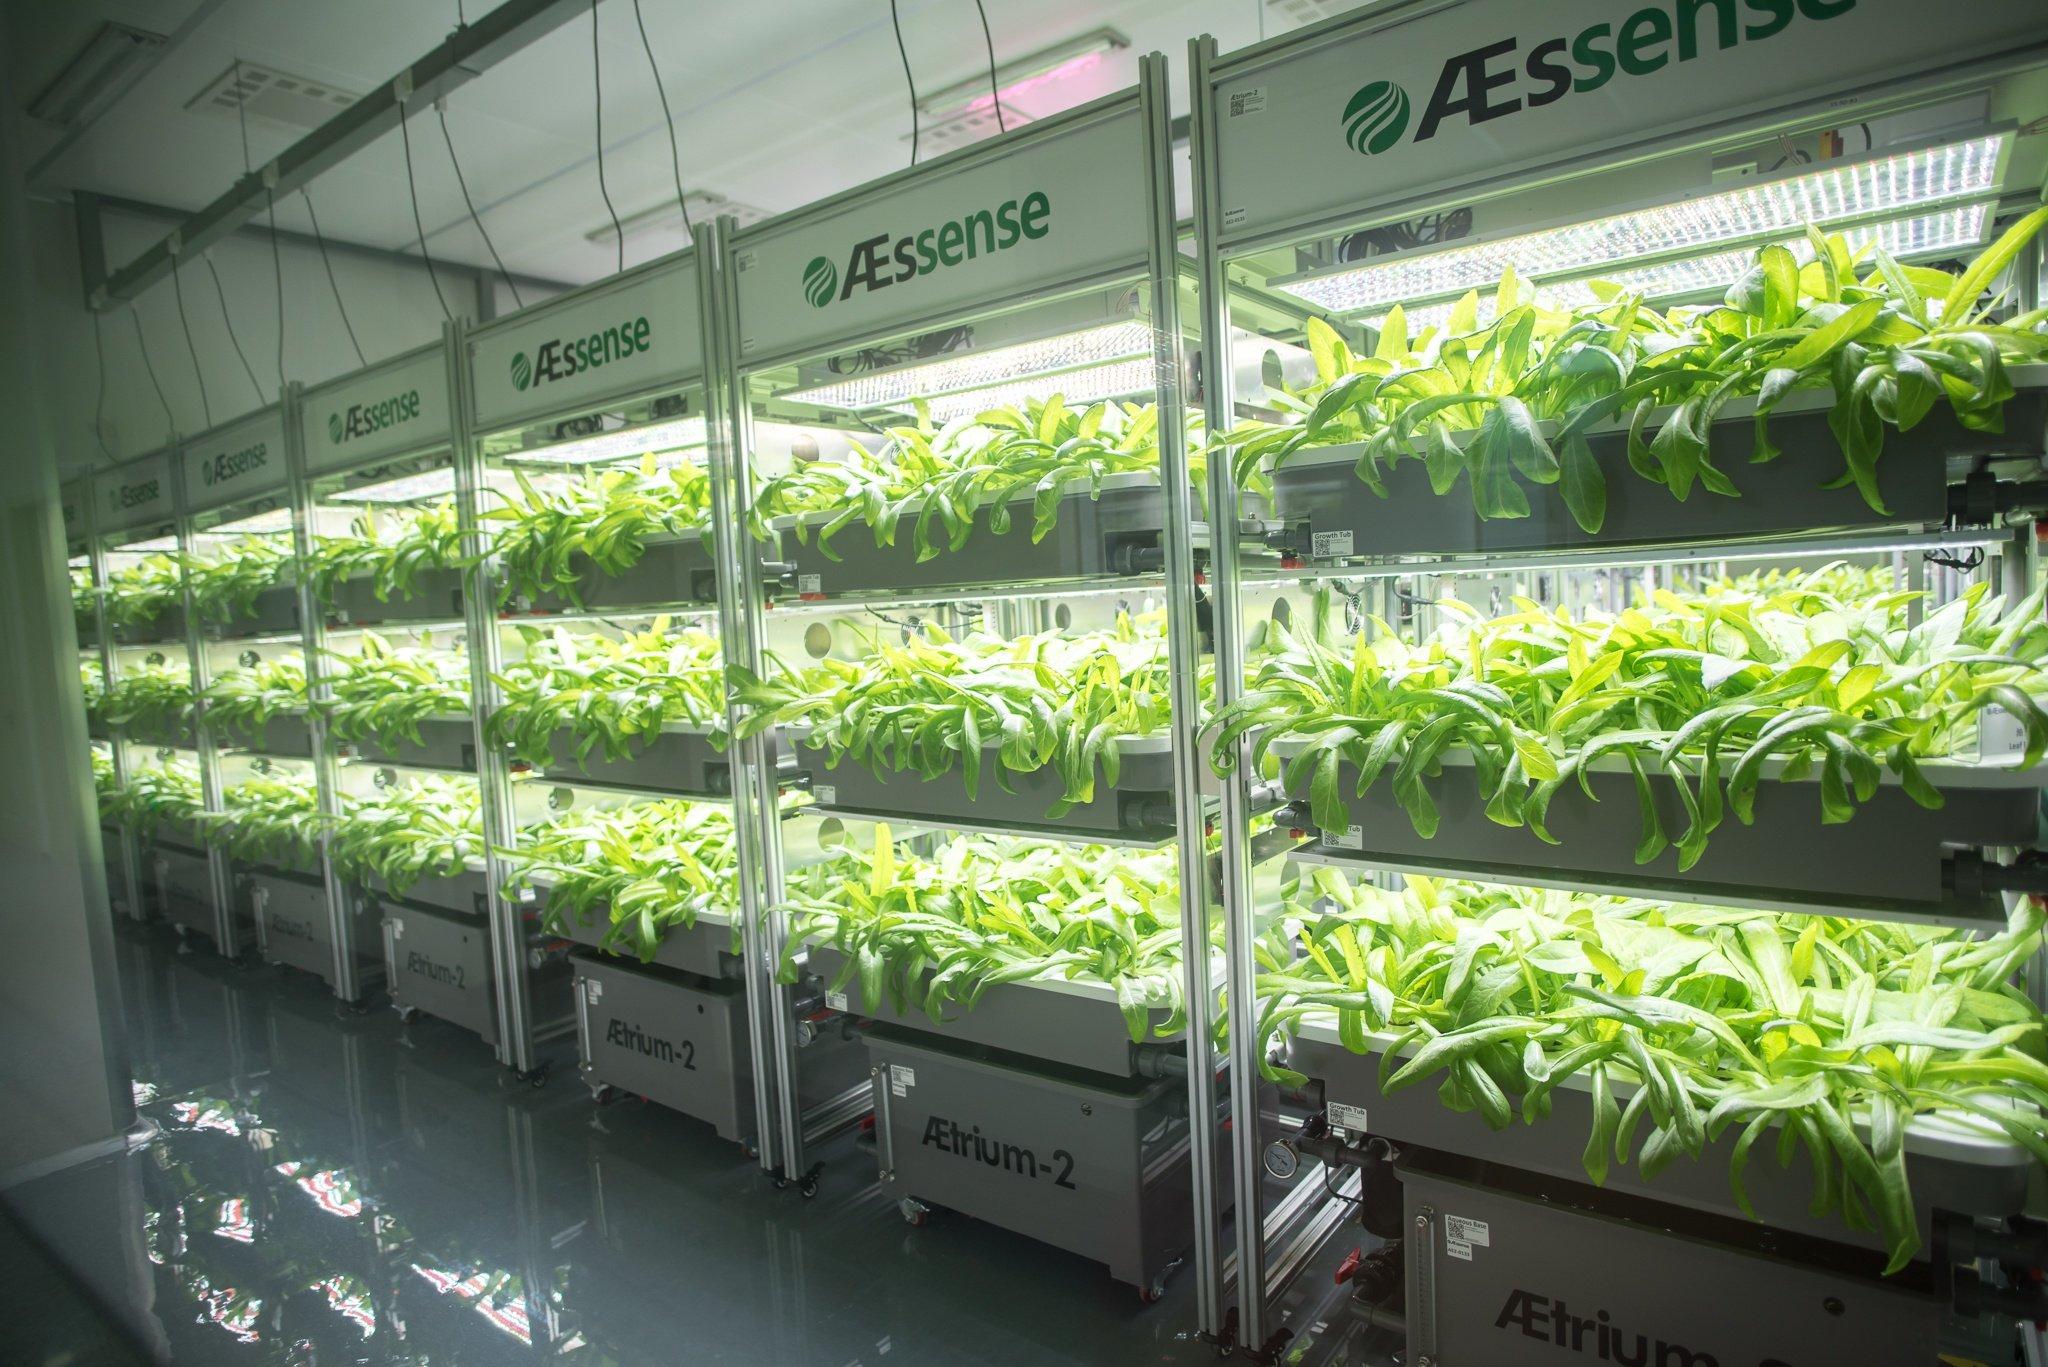 AEssenseGrows Fresh AEtrium-2 Growth